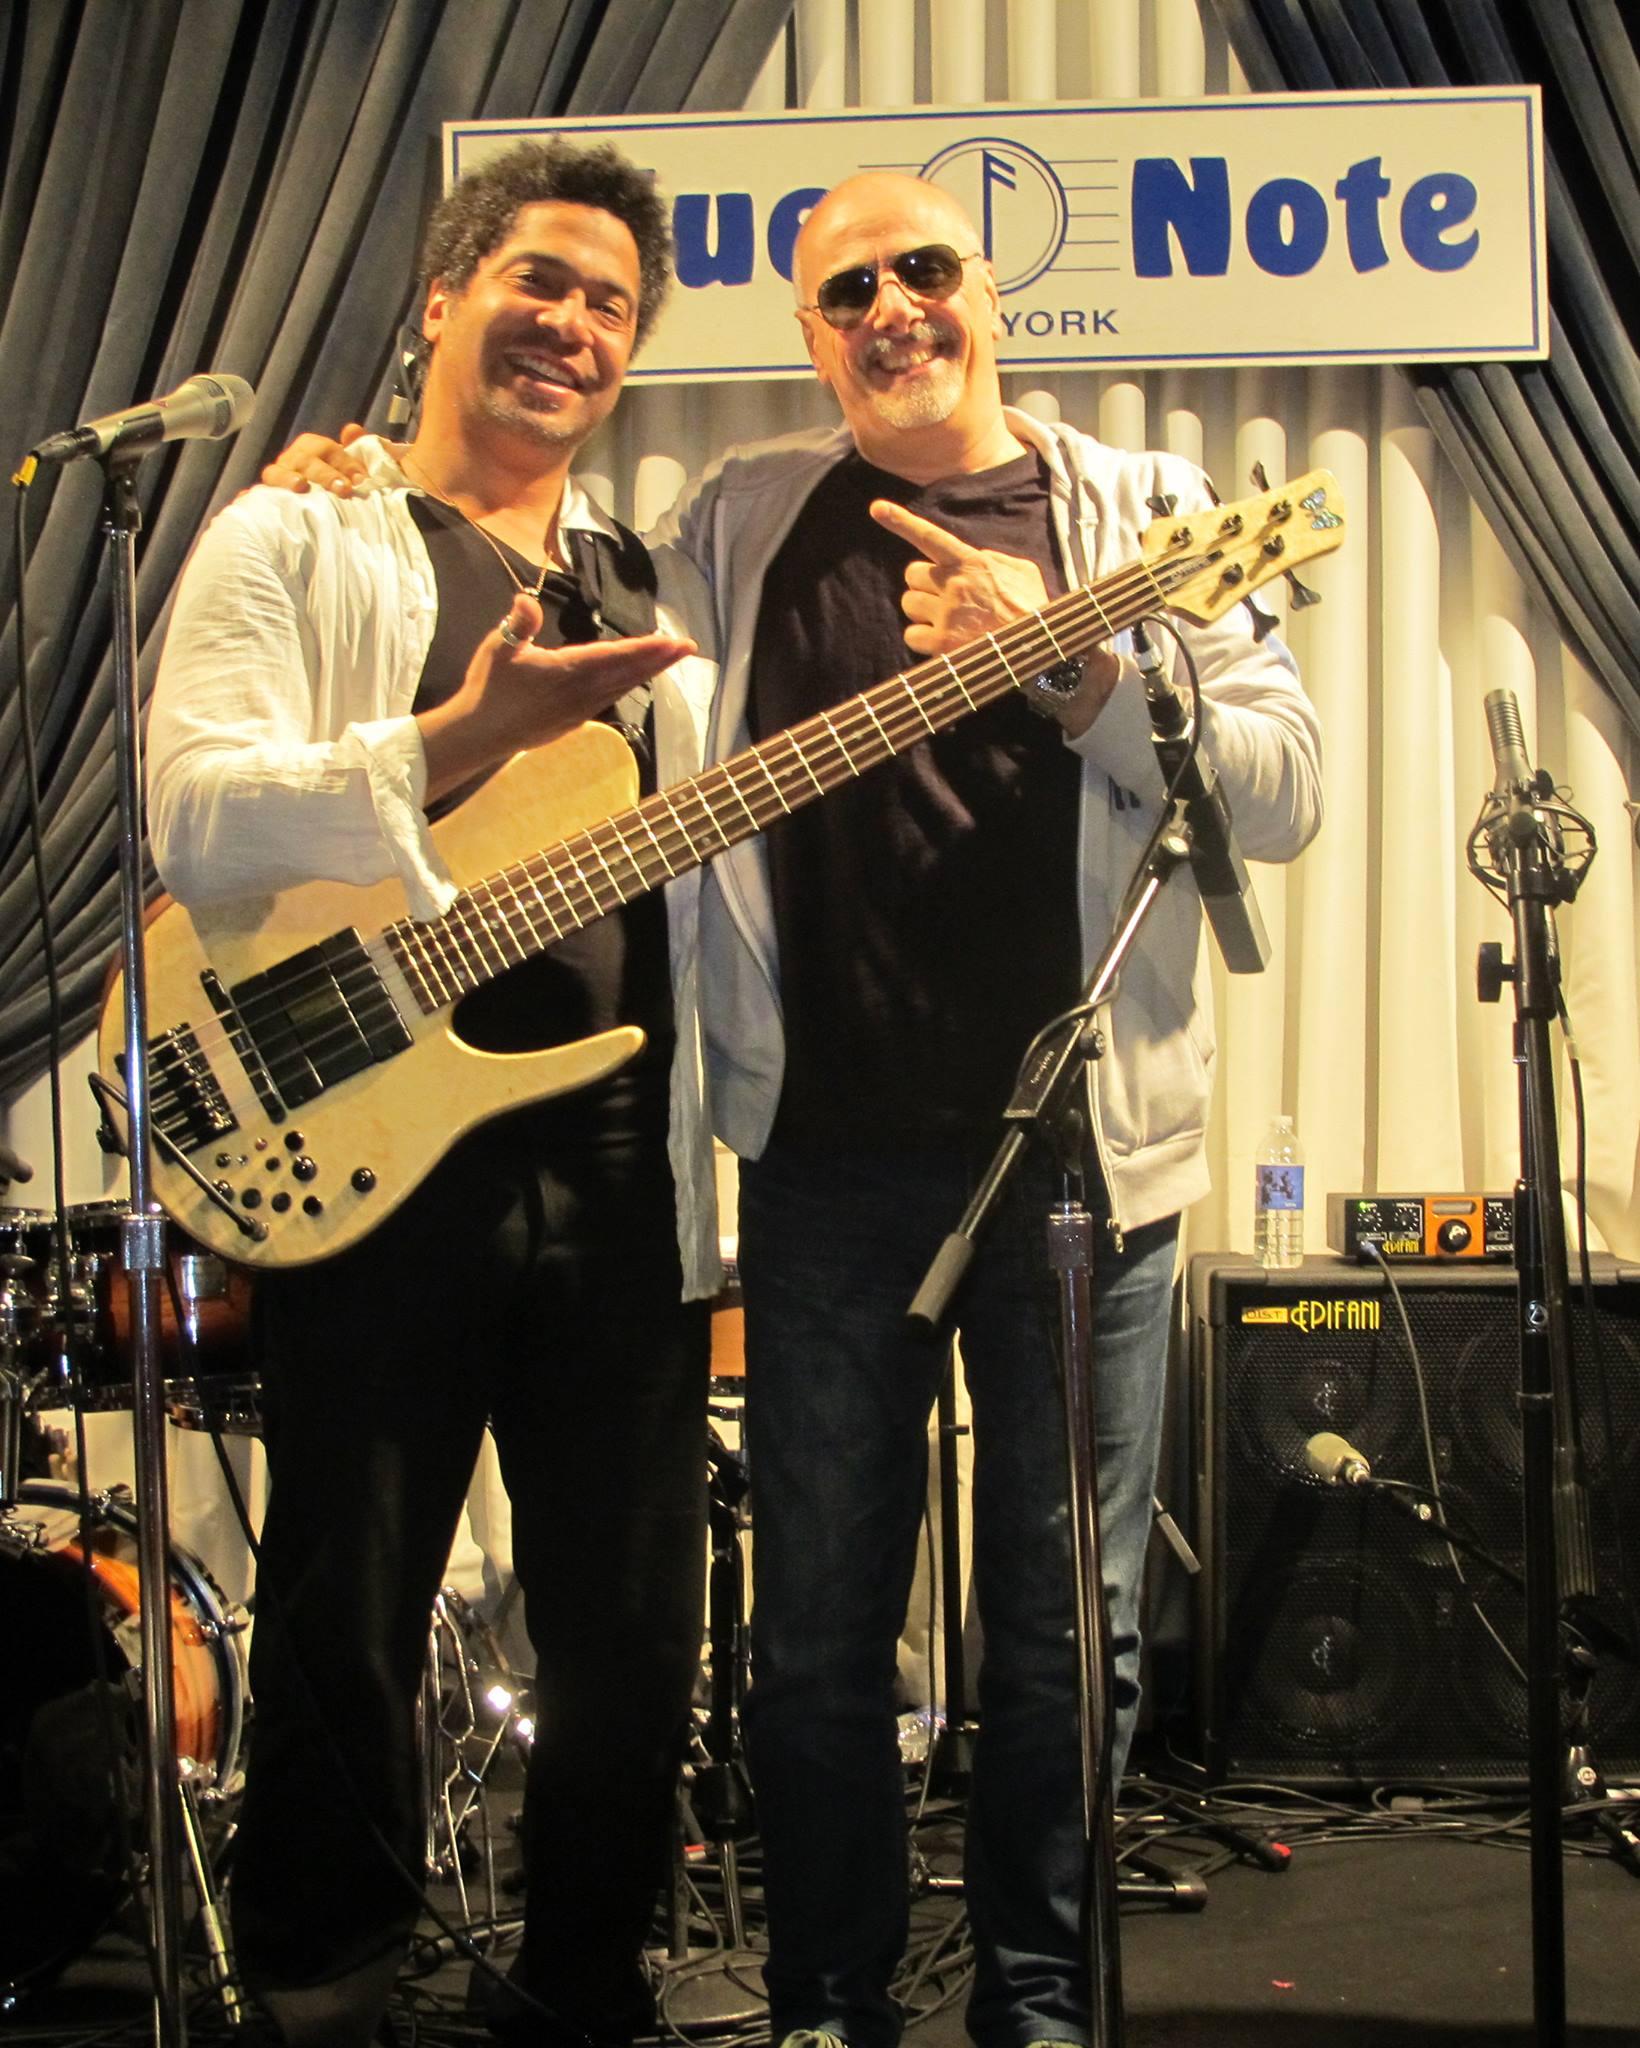 (L to R): Matt Garrison and Nick Epifani